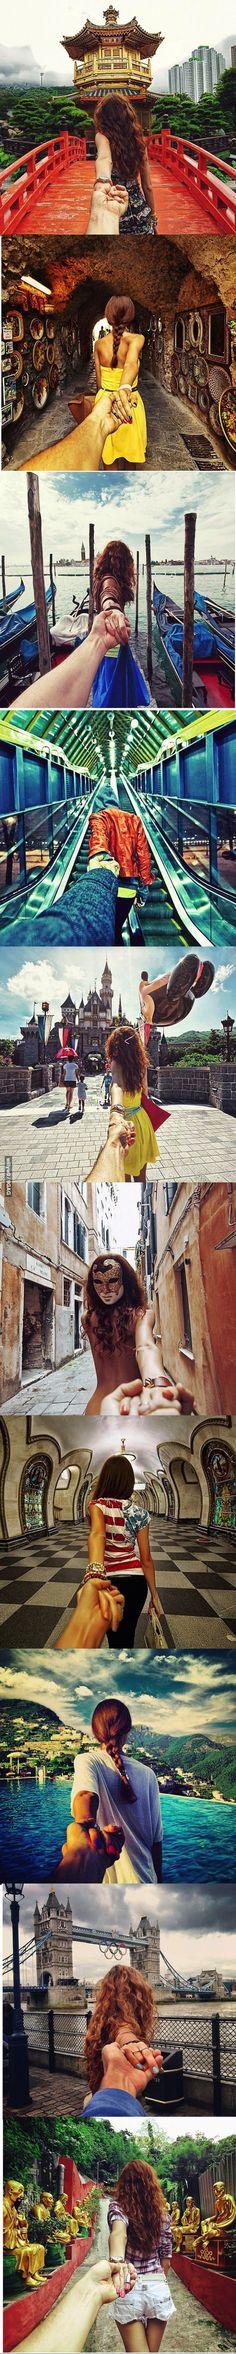 "<3 Murad Osmann Photographic Project ""Follow Me"" of Girlfriend leading him around the world."